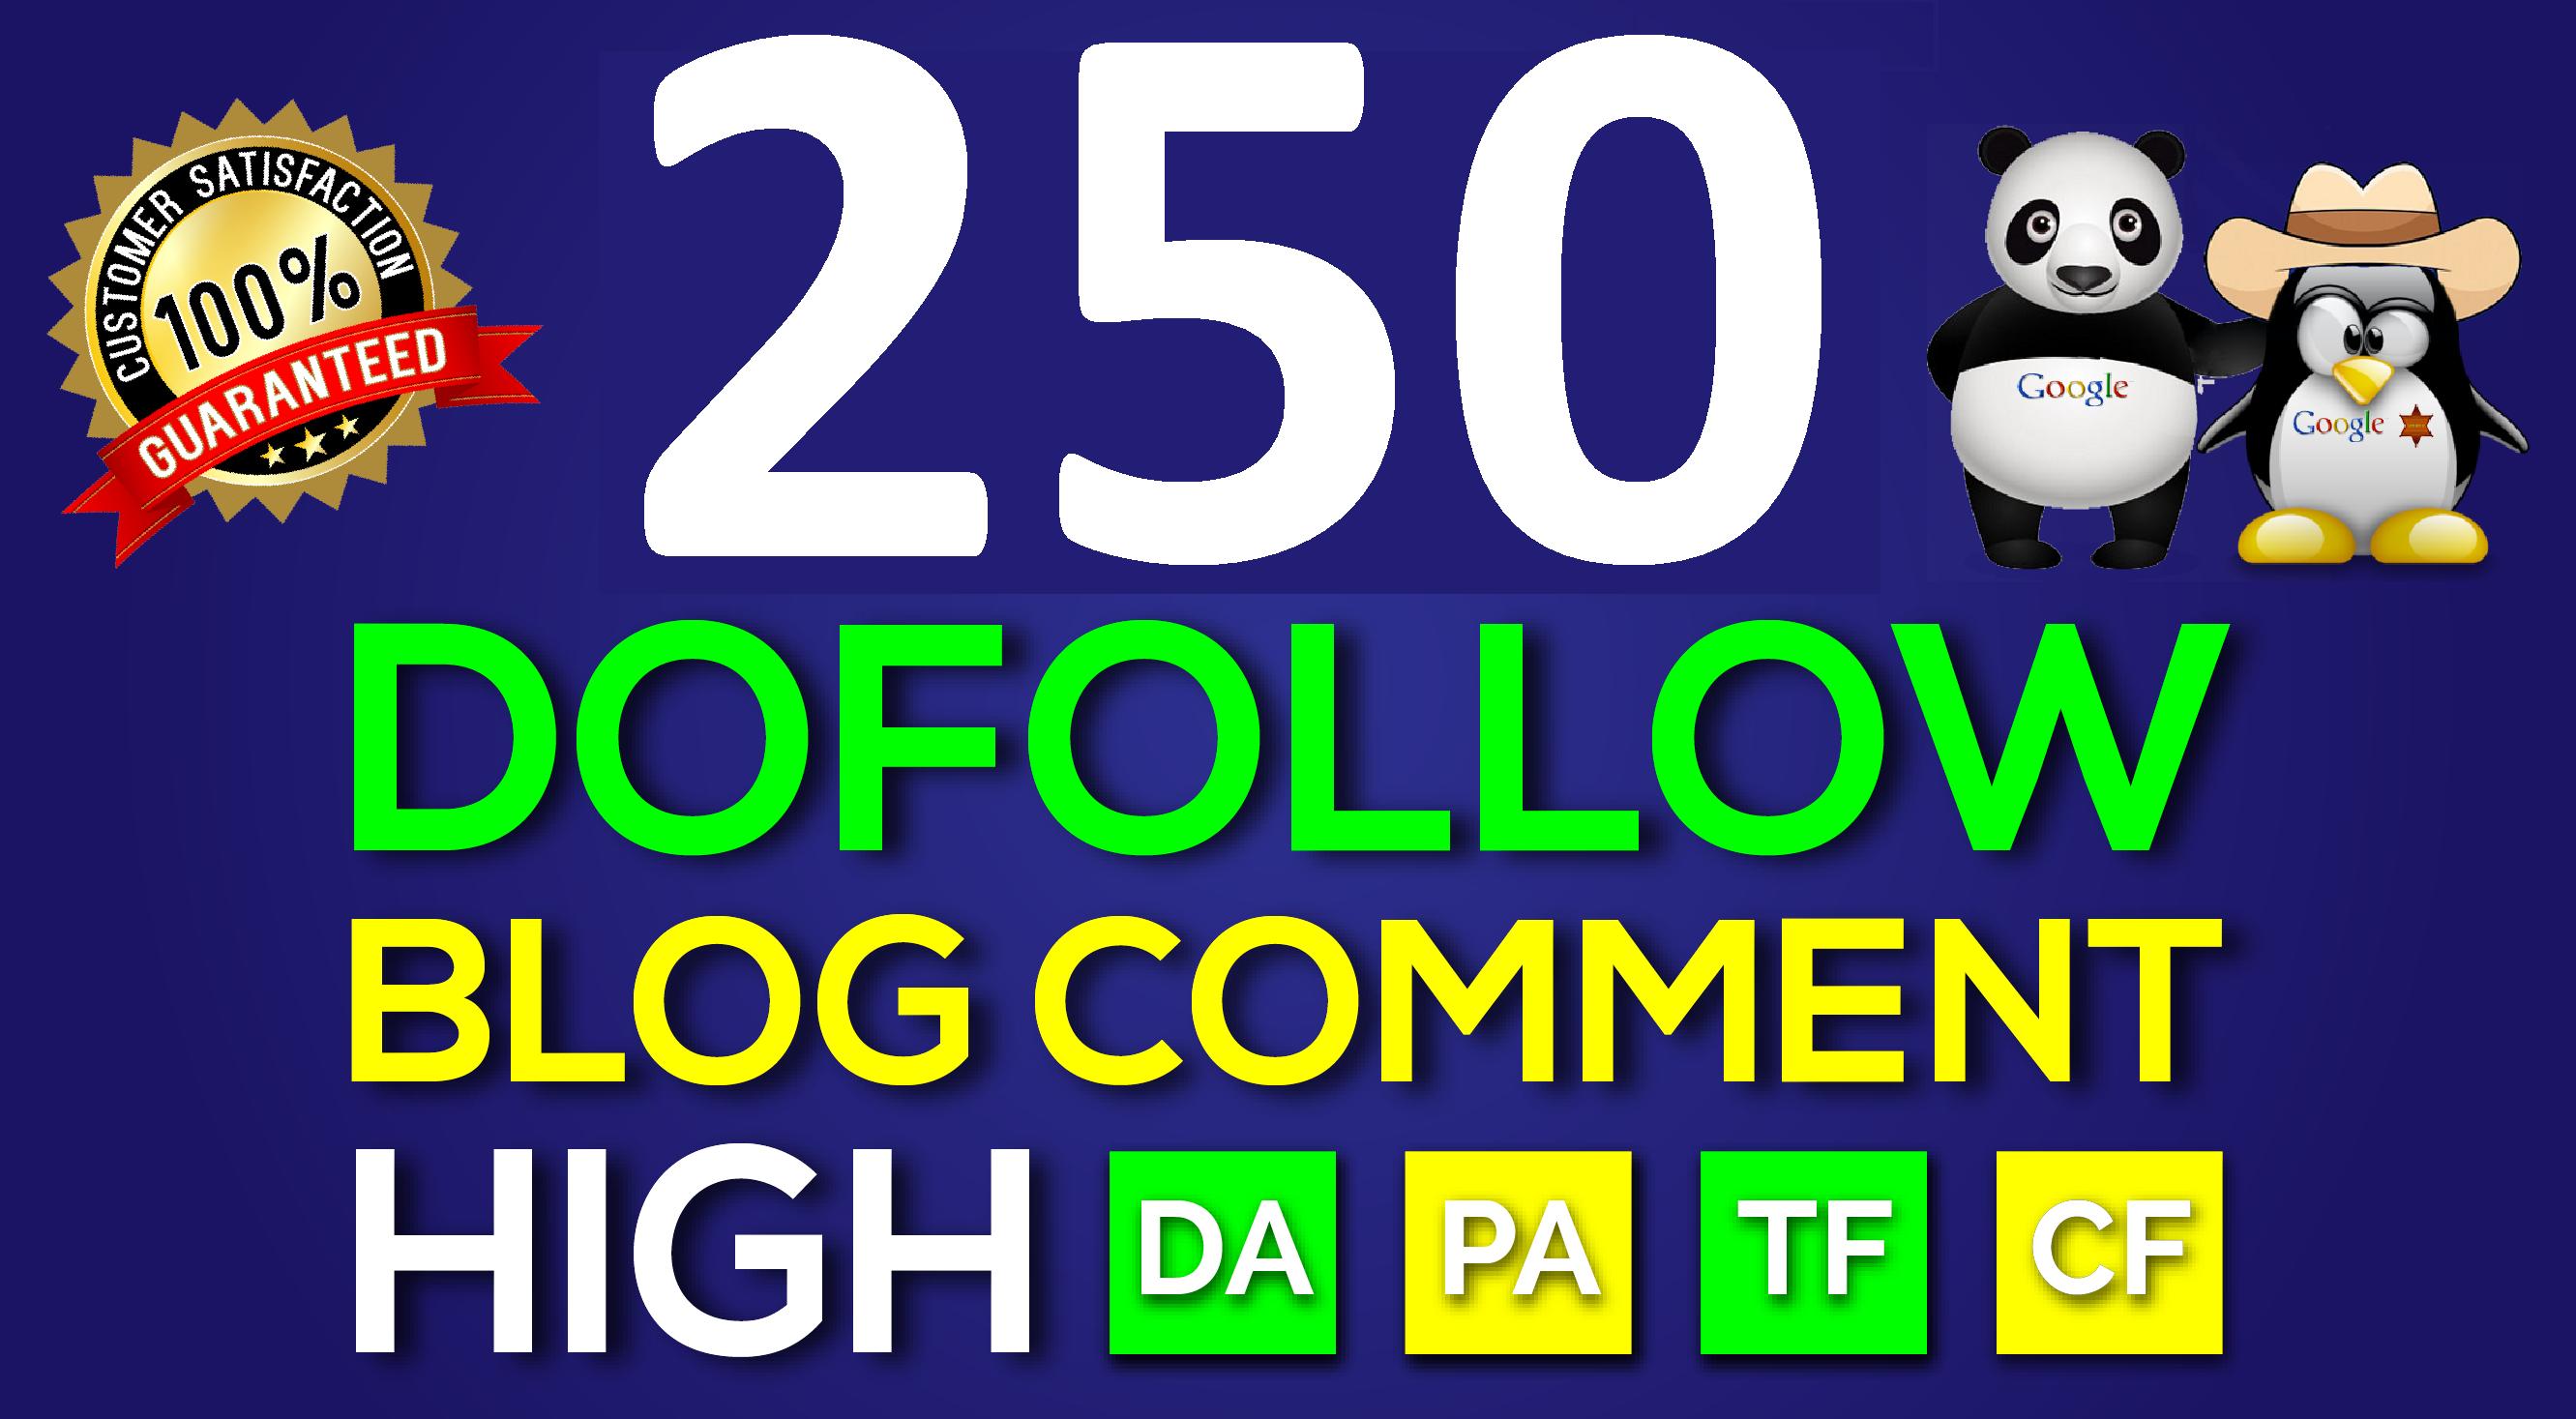 250 high quality blog comments dofollow backlinks high da pa tc cf